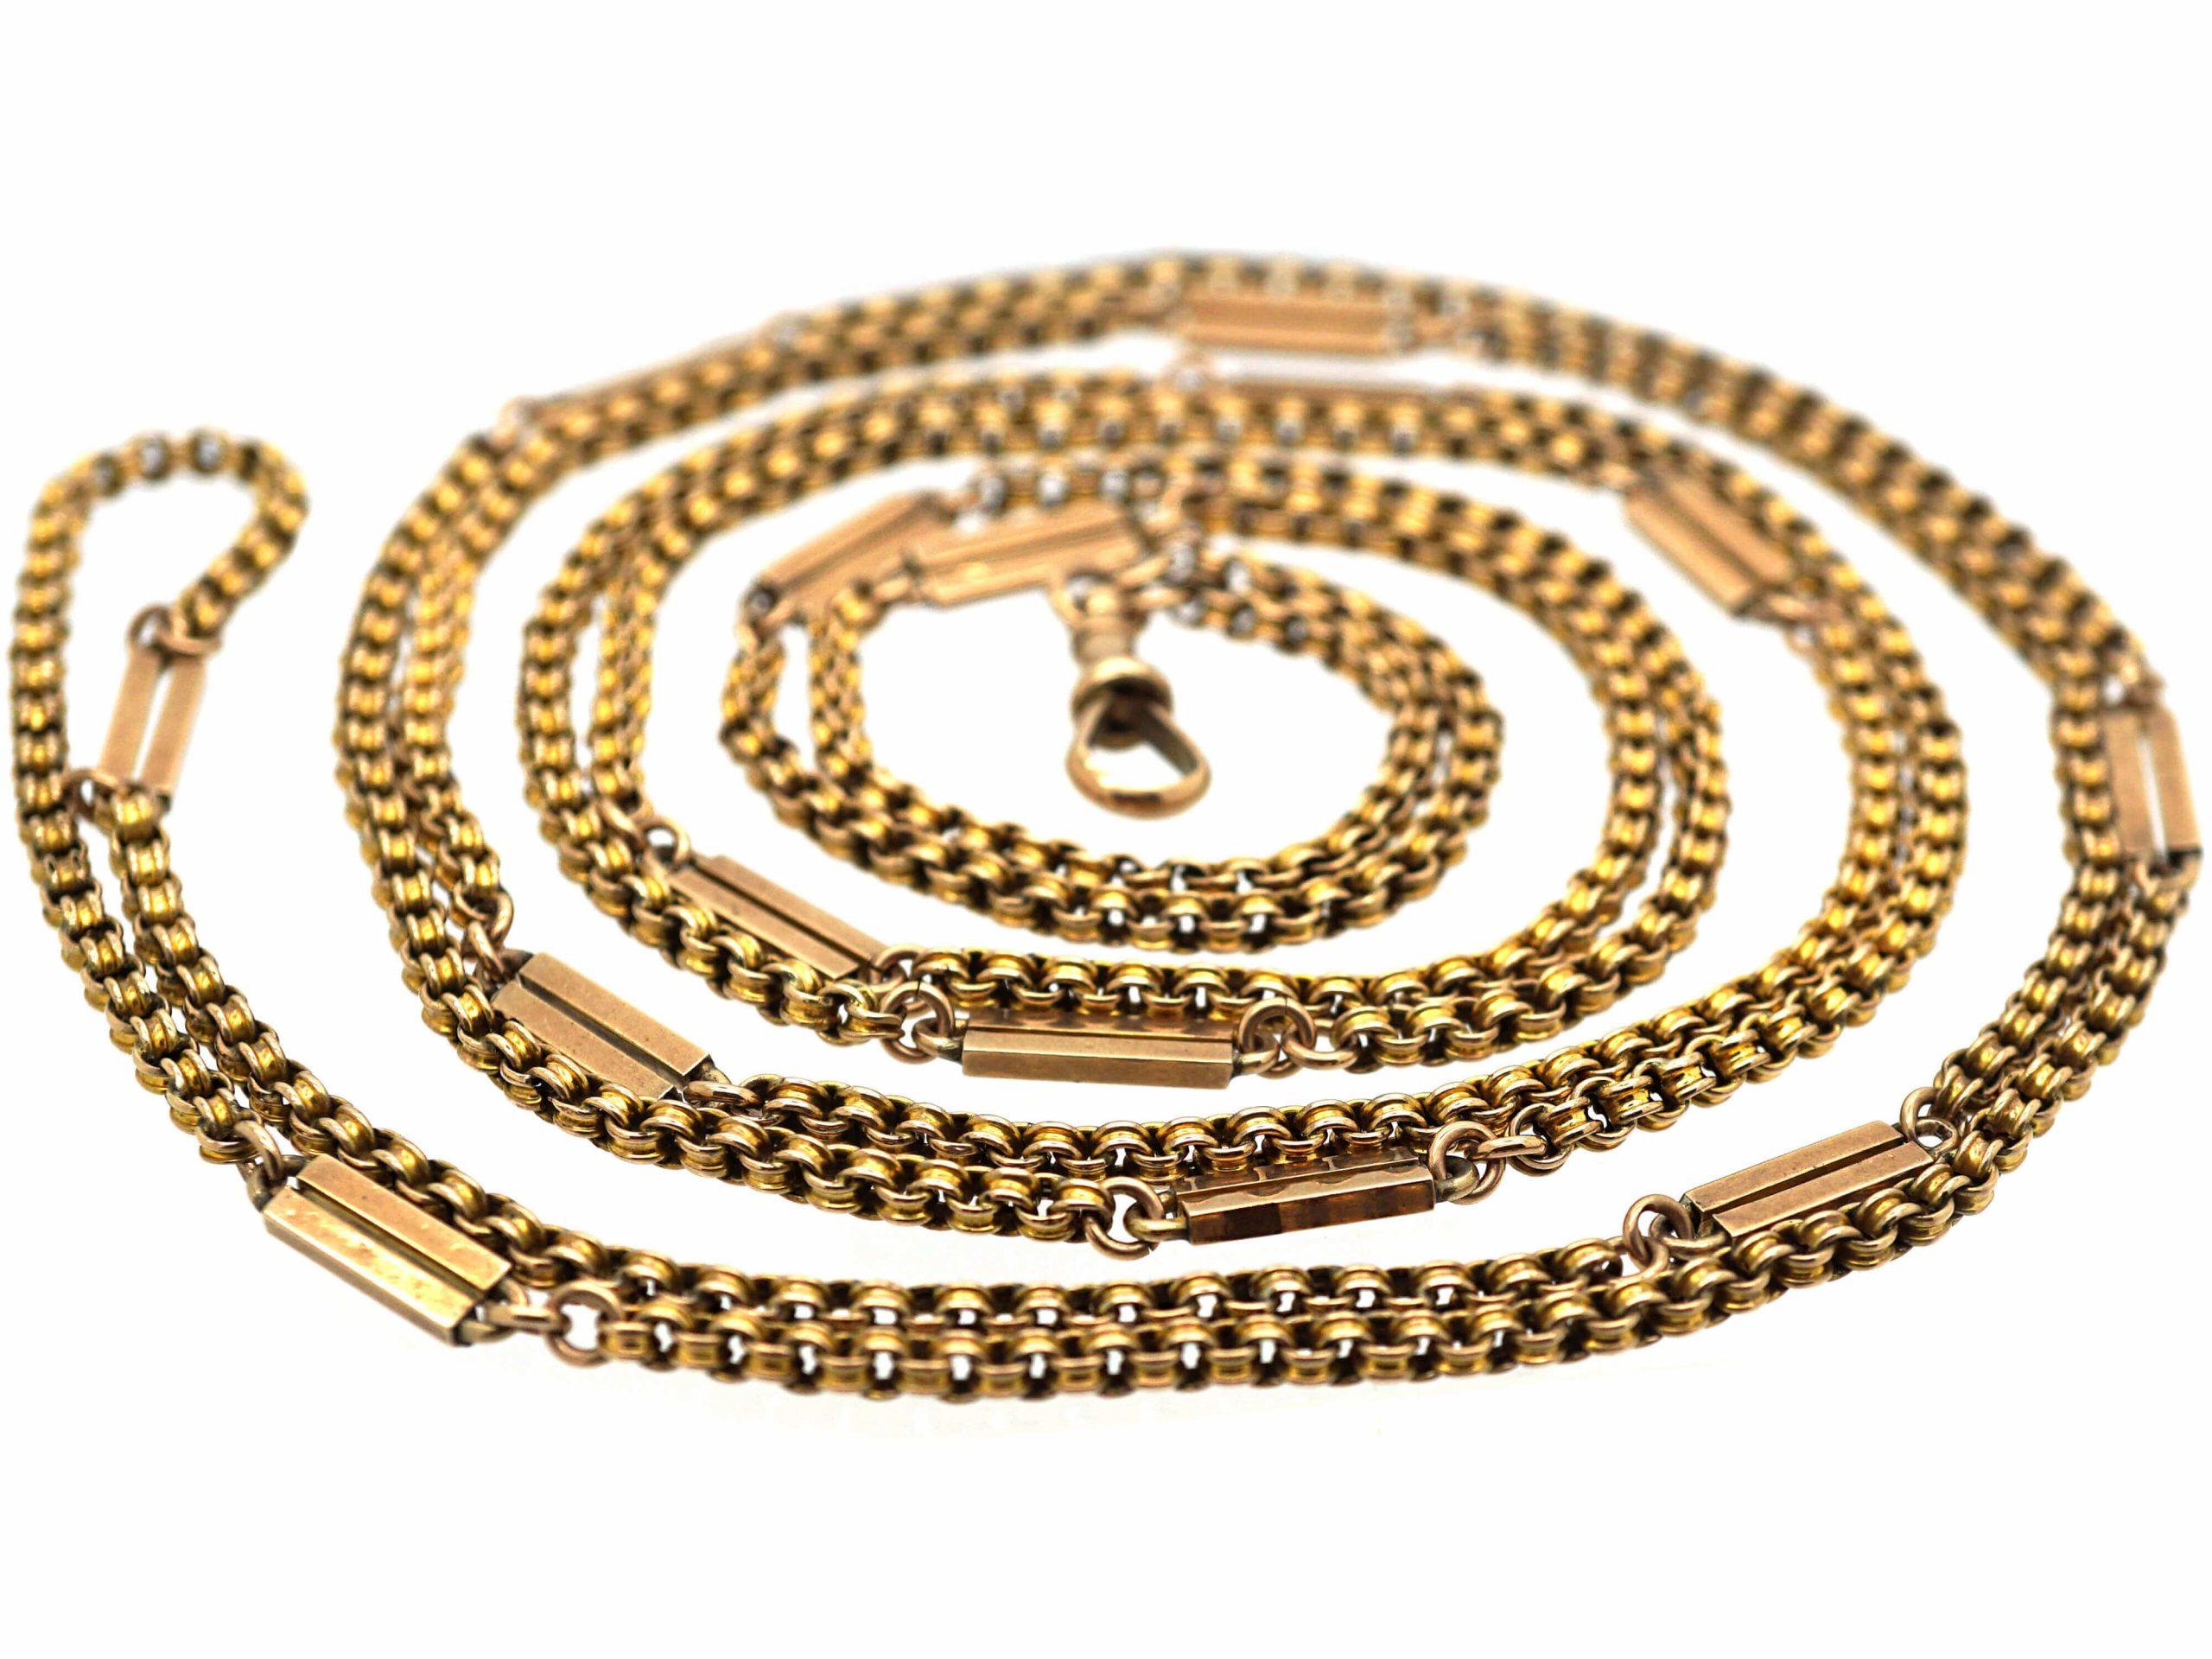 9ct Gold Victorian Guard Chain